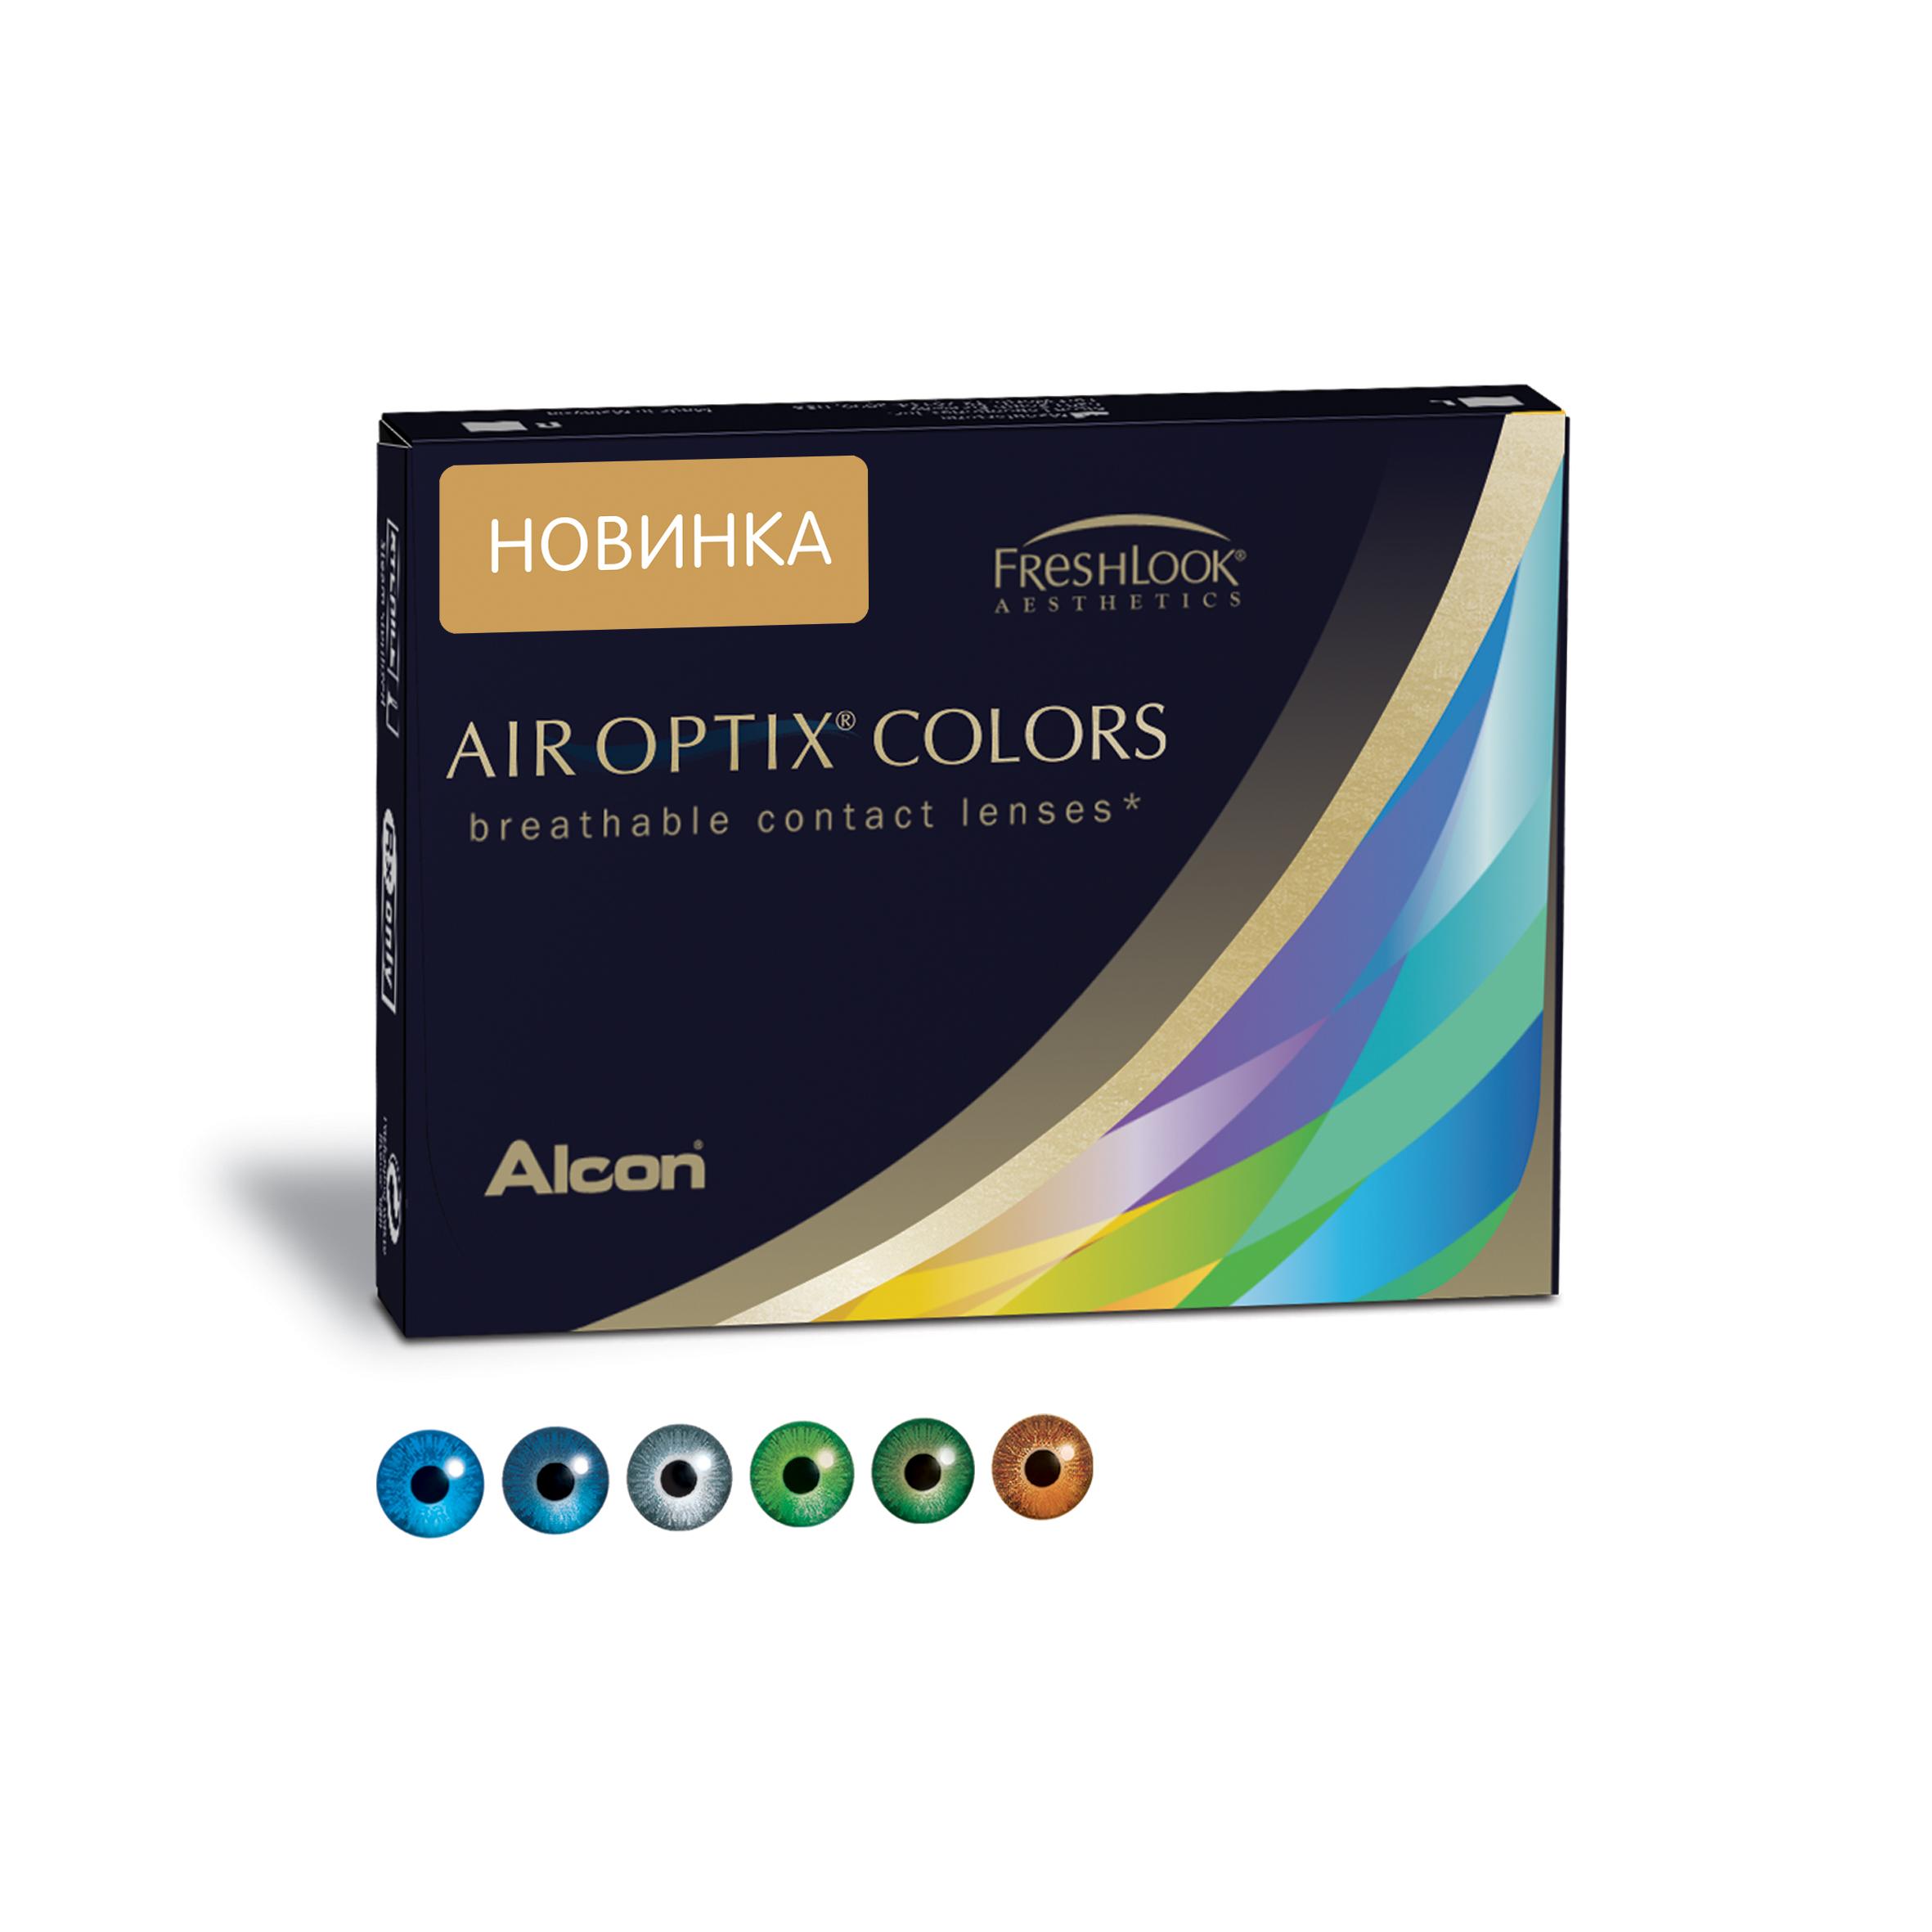 Аlcon контактные линзы Air Optix Colors 2 шт -3.75 Sterling Gray